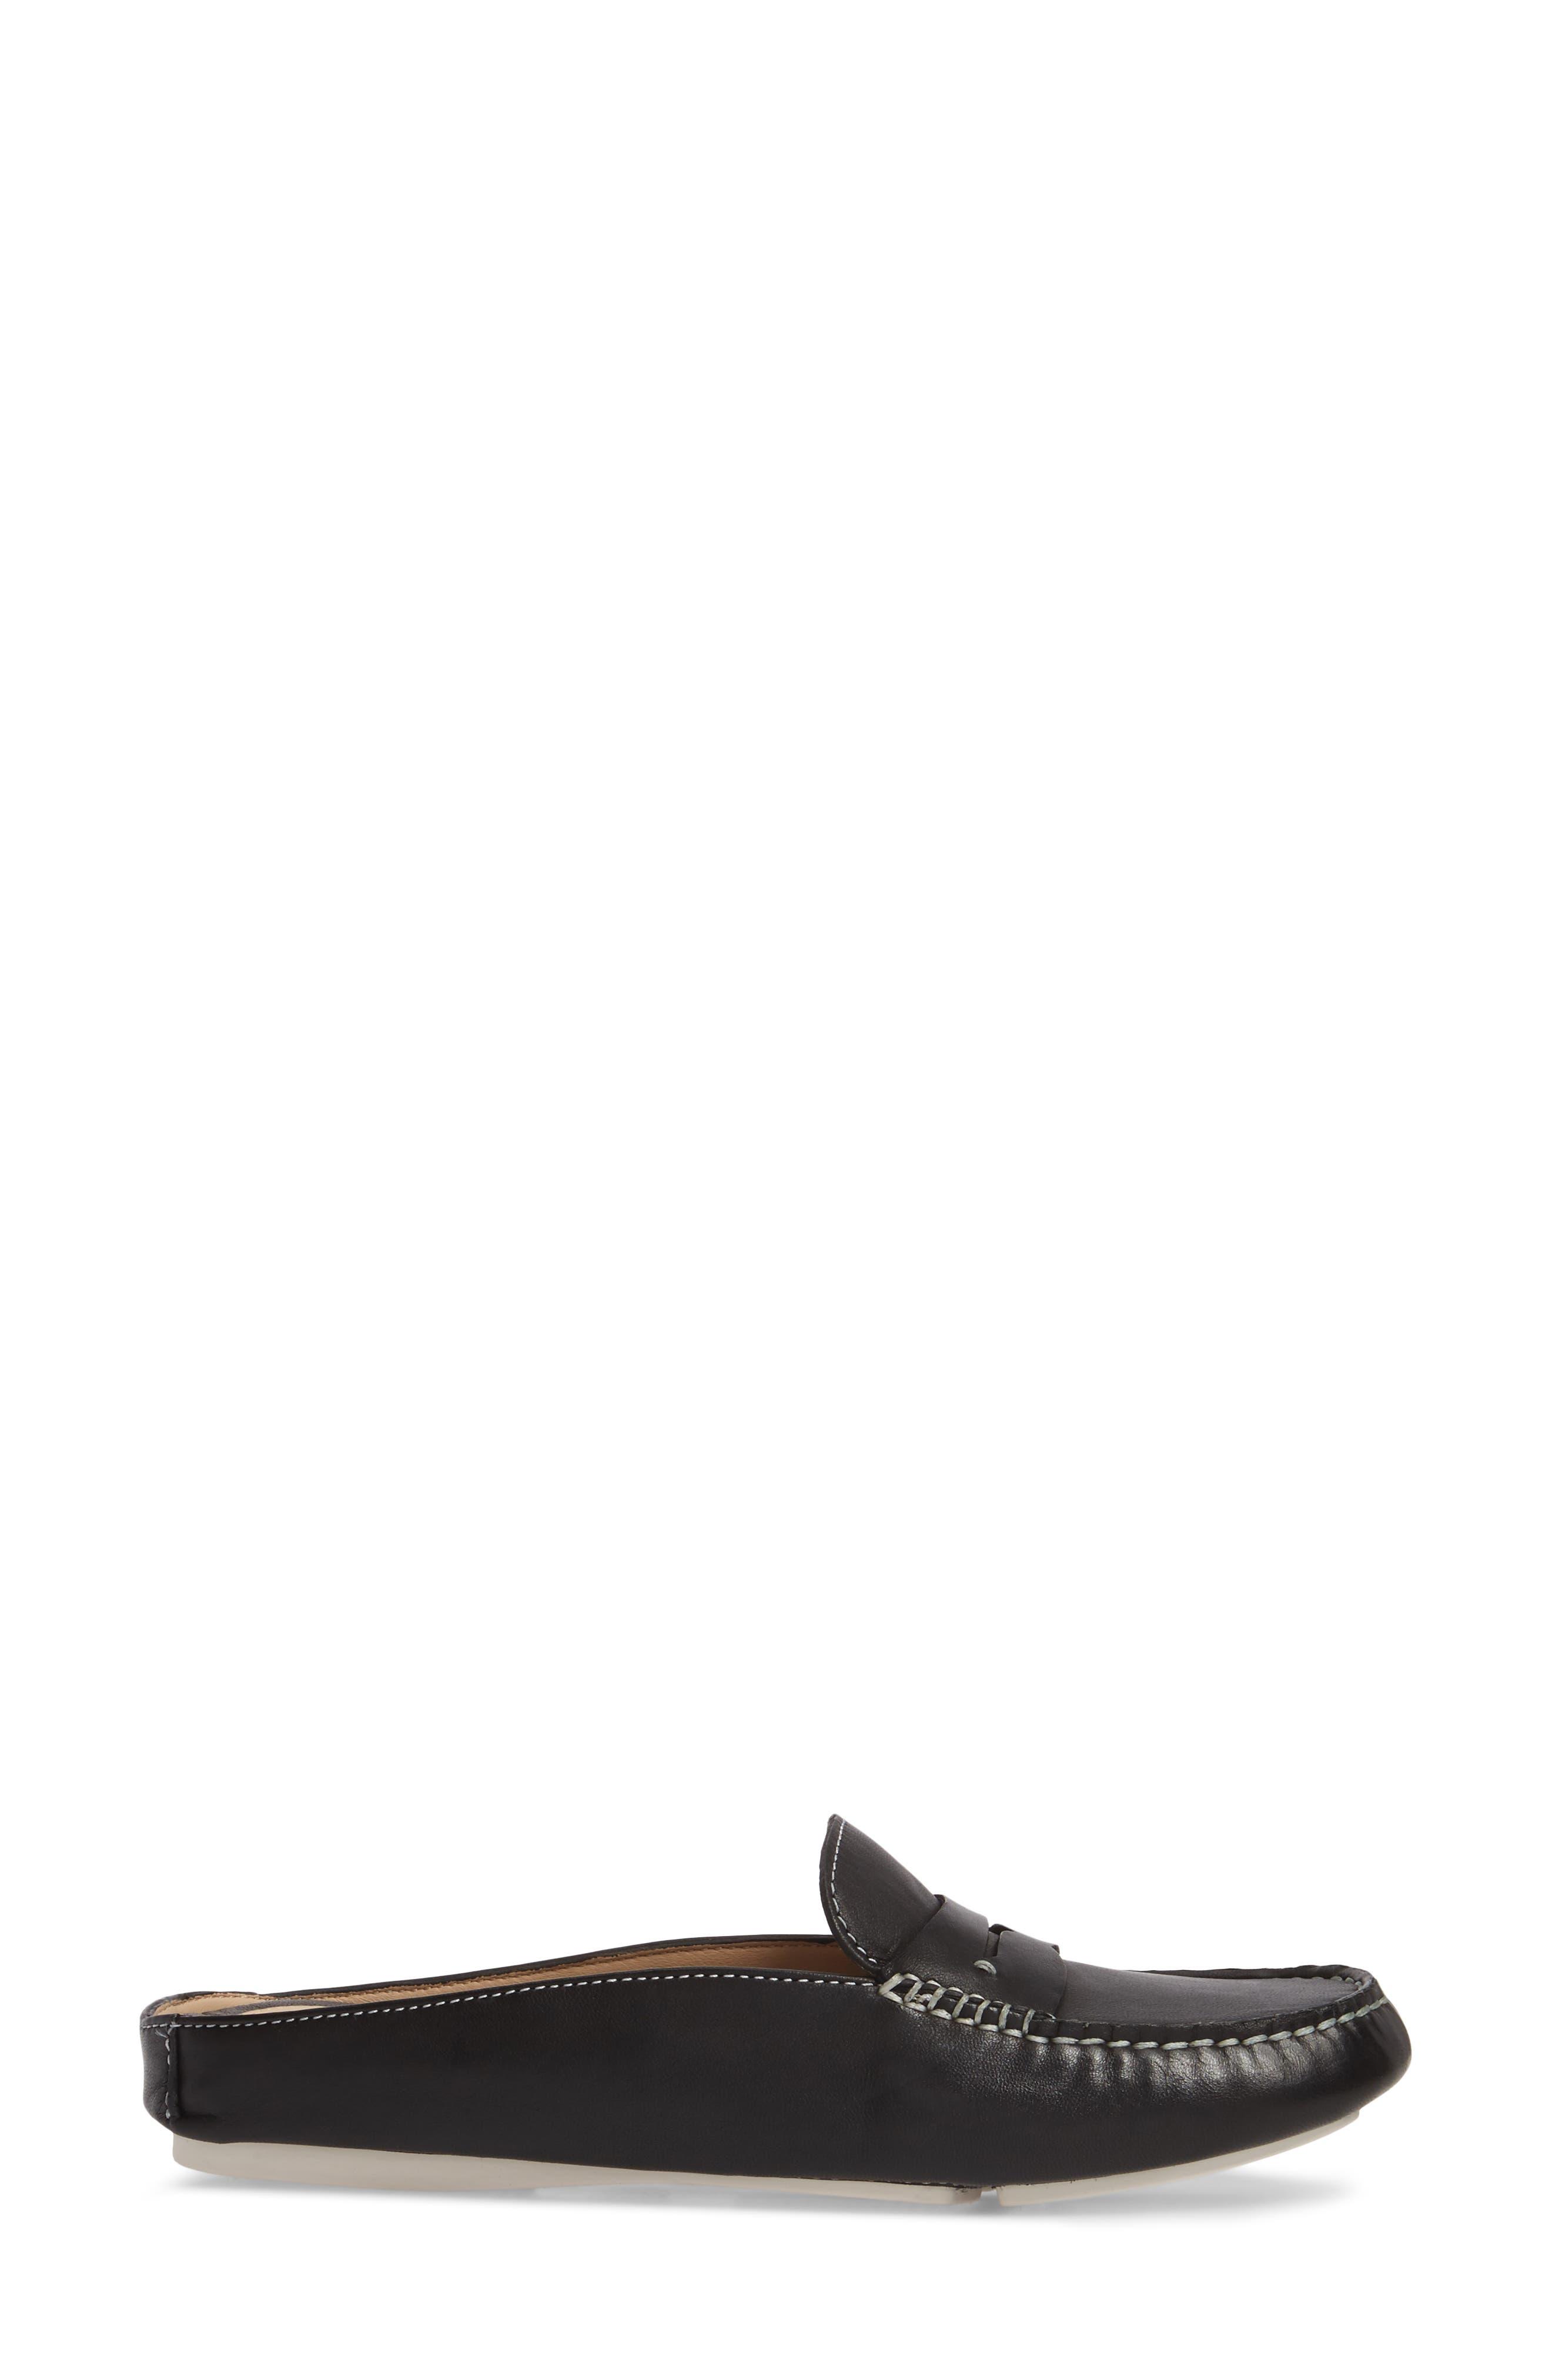 Myah Loafer Mule,                             Alternate thumbnail 3, color,                             001